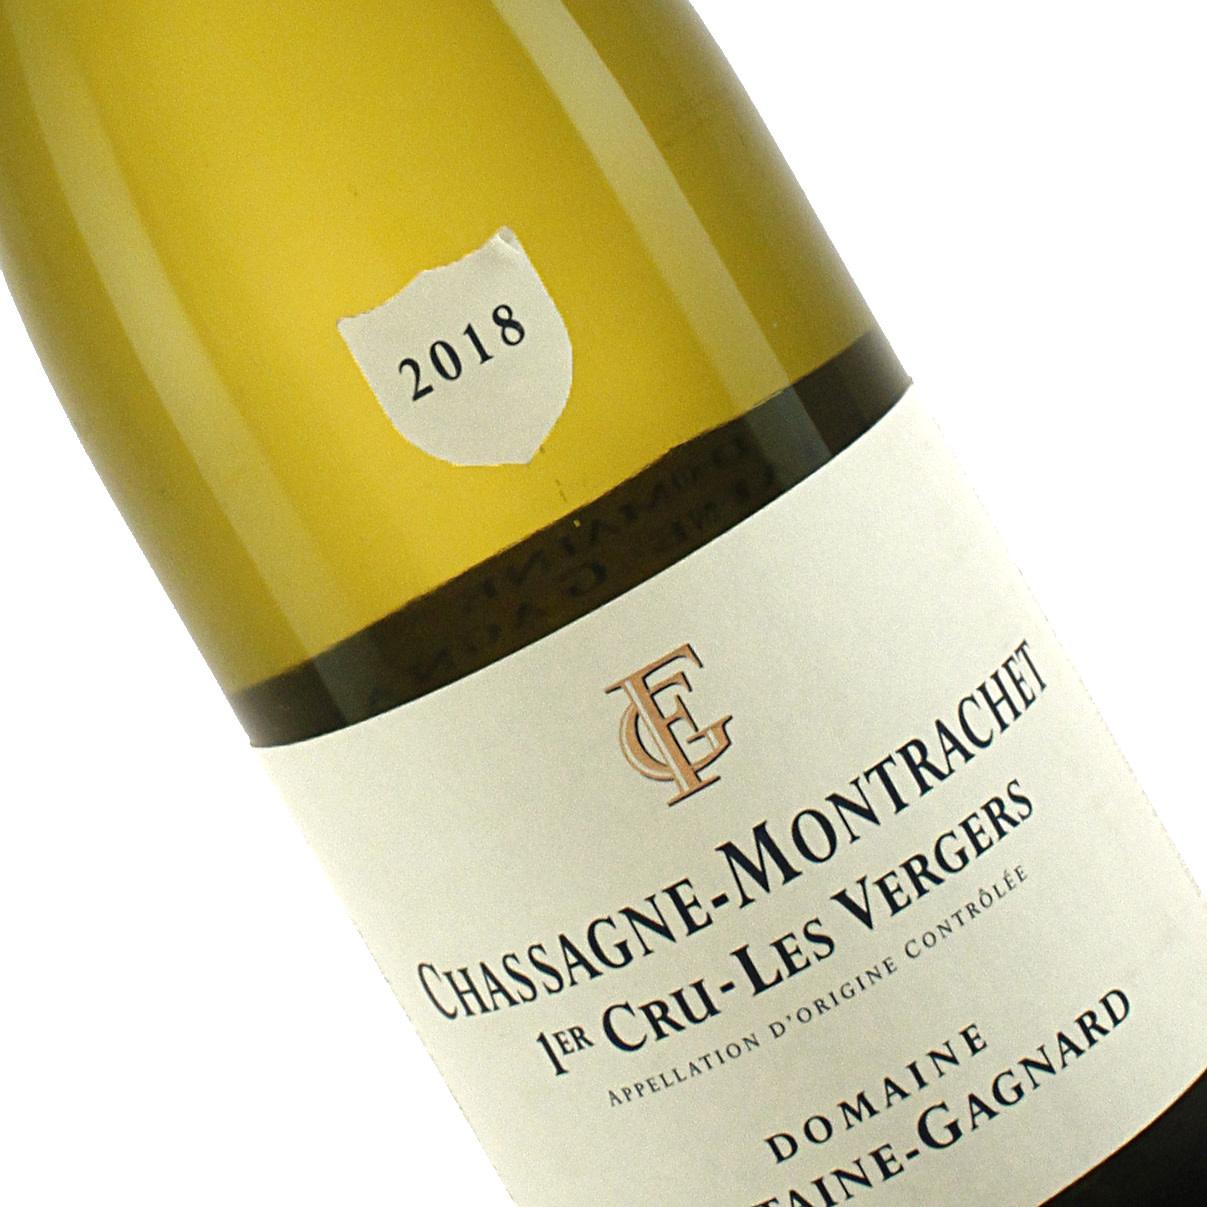 Domaine Fontaine-Gagnard 2018 Chassagne Montrachet 1er Cru - Les Vergers , Burgundy